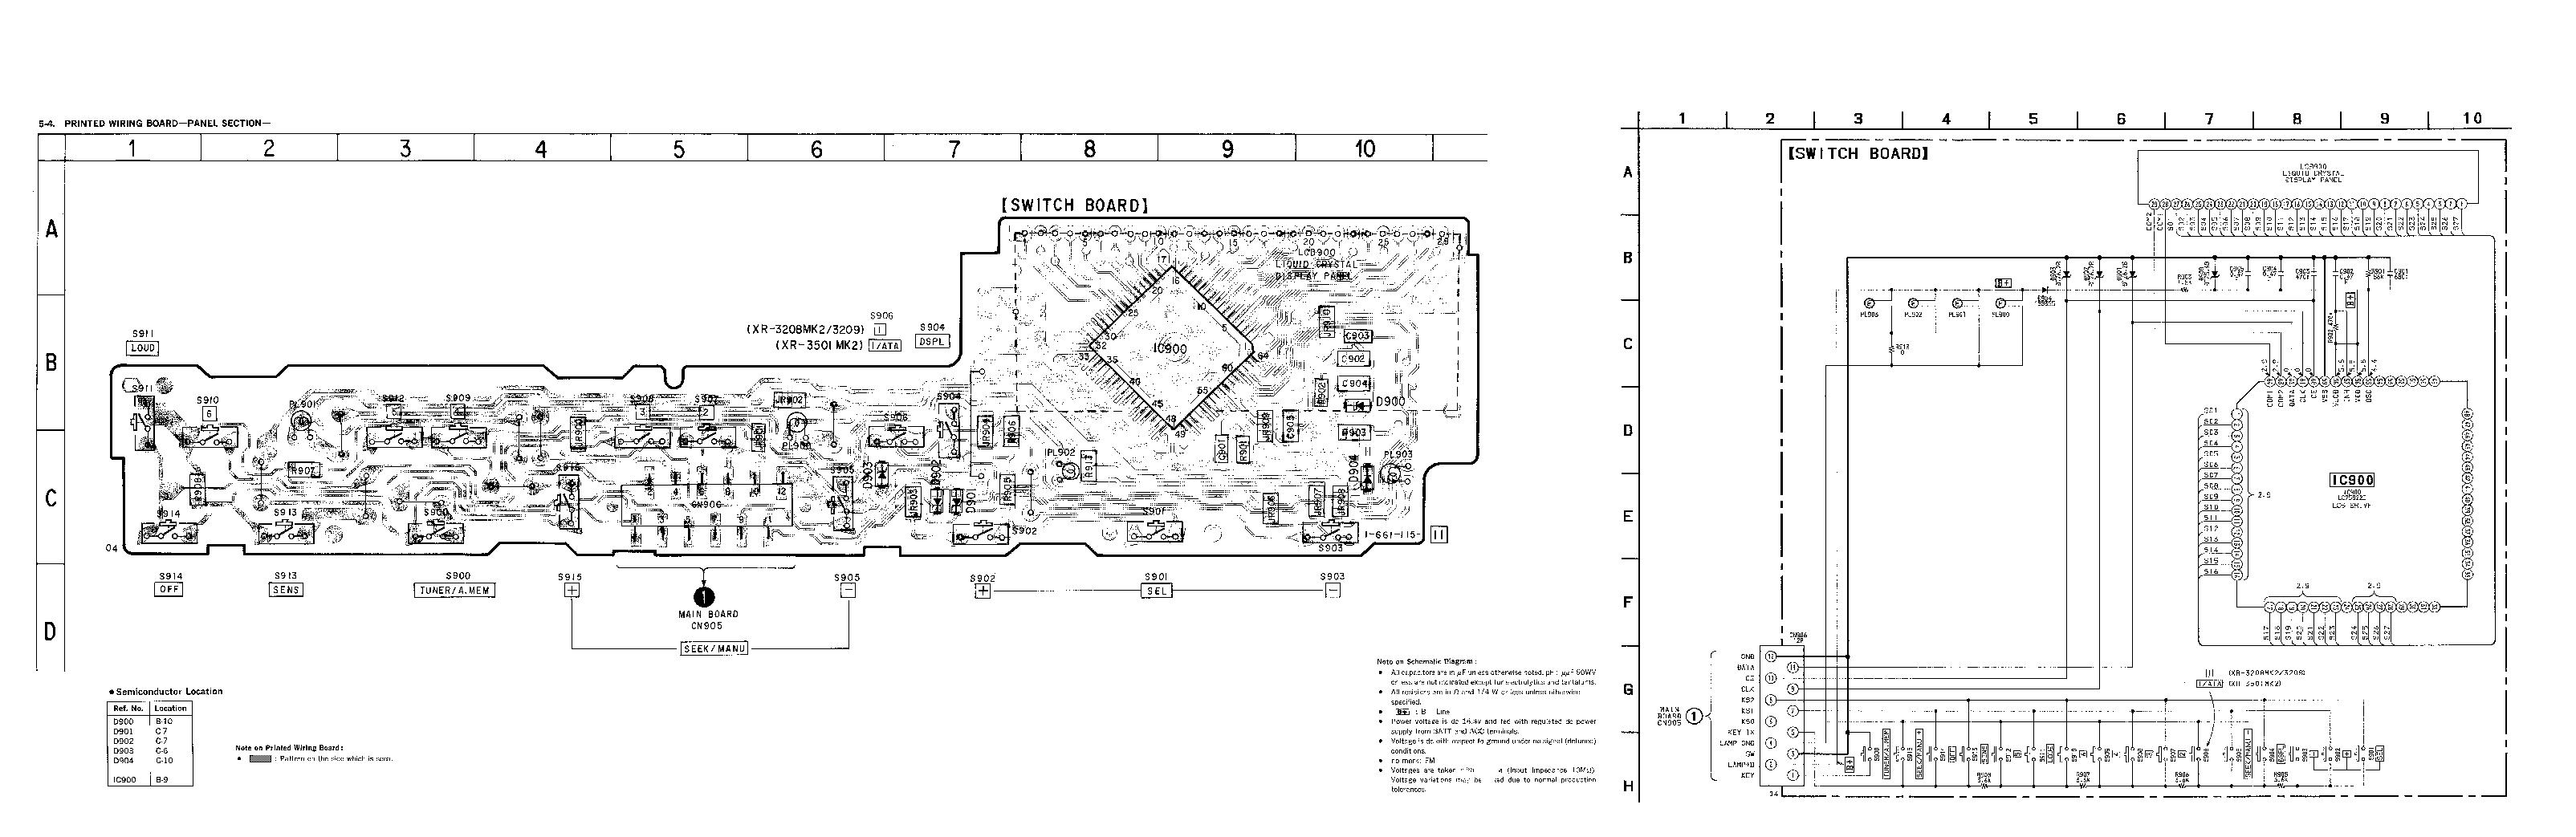 sony cdx m30 wiring diagram